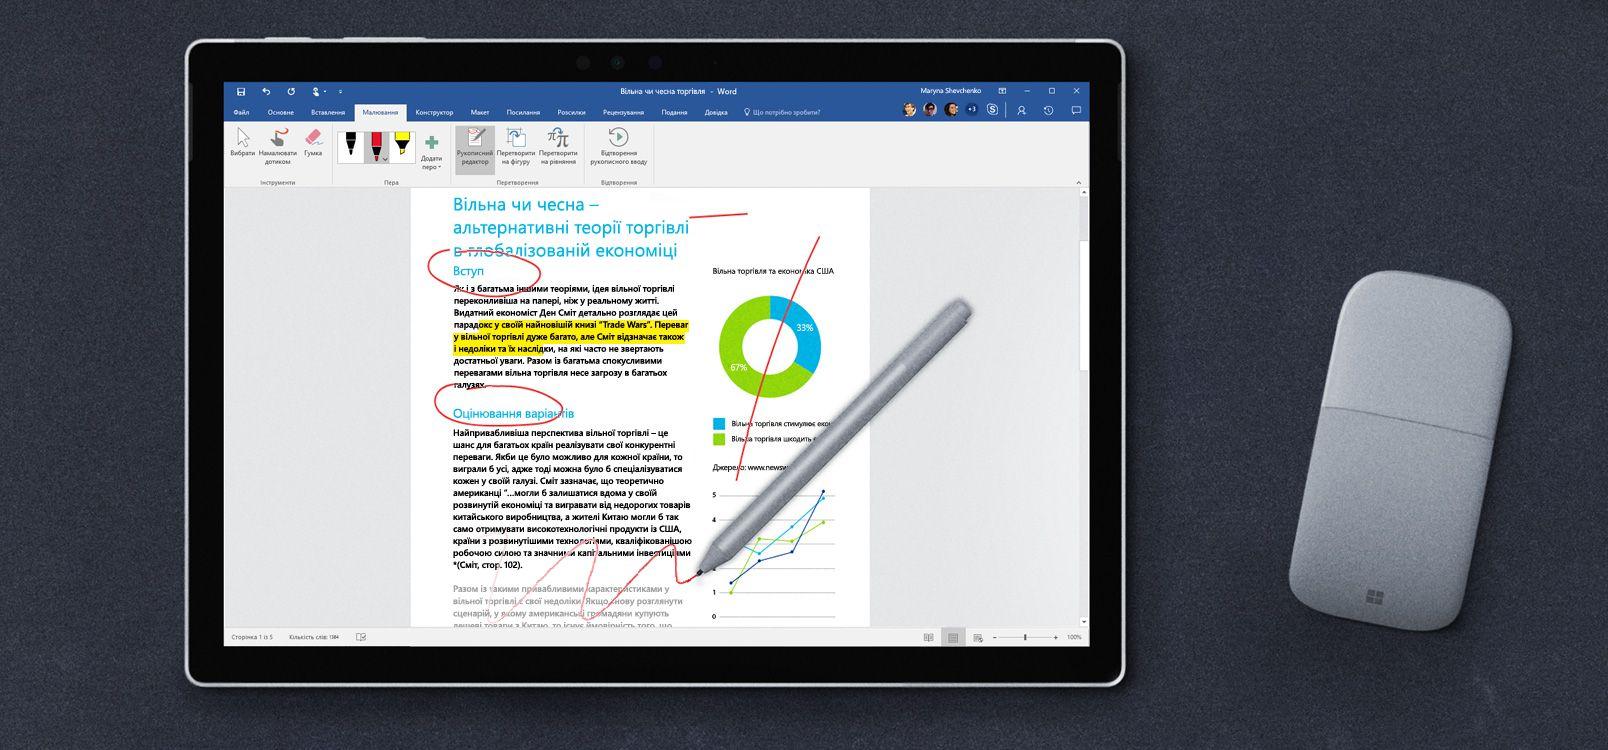 Екран планшета, на якому показано Рукописний редактор